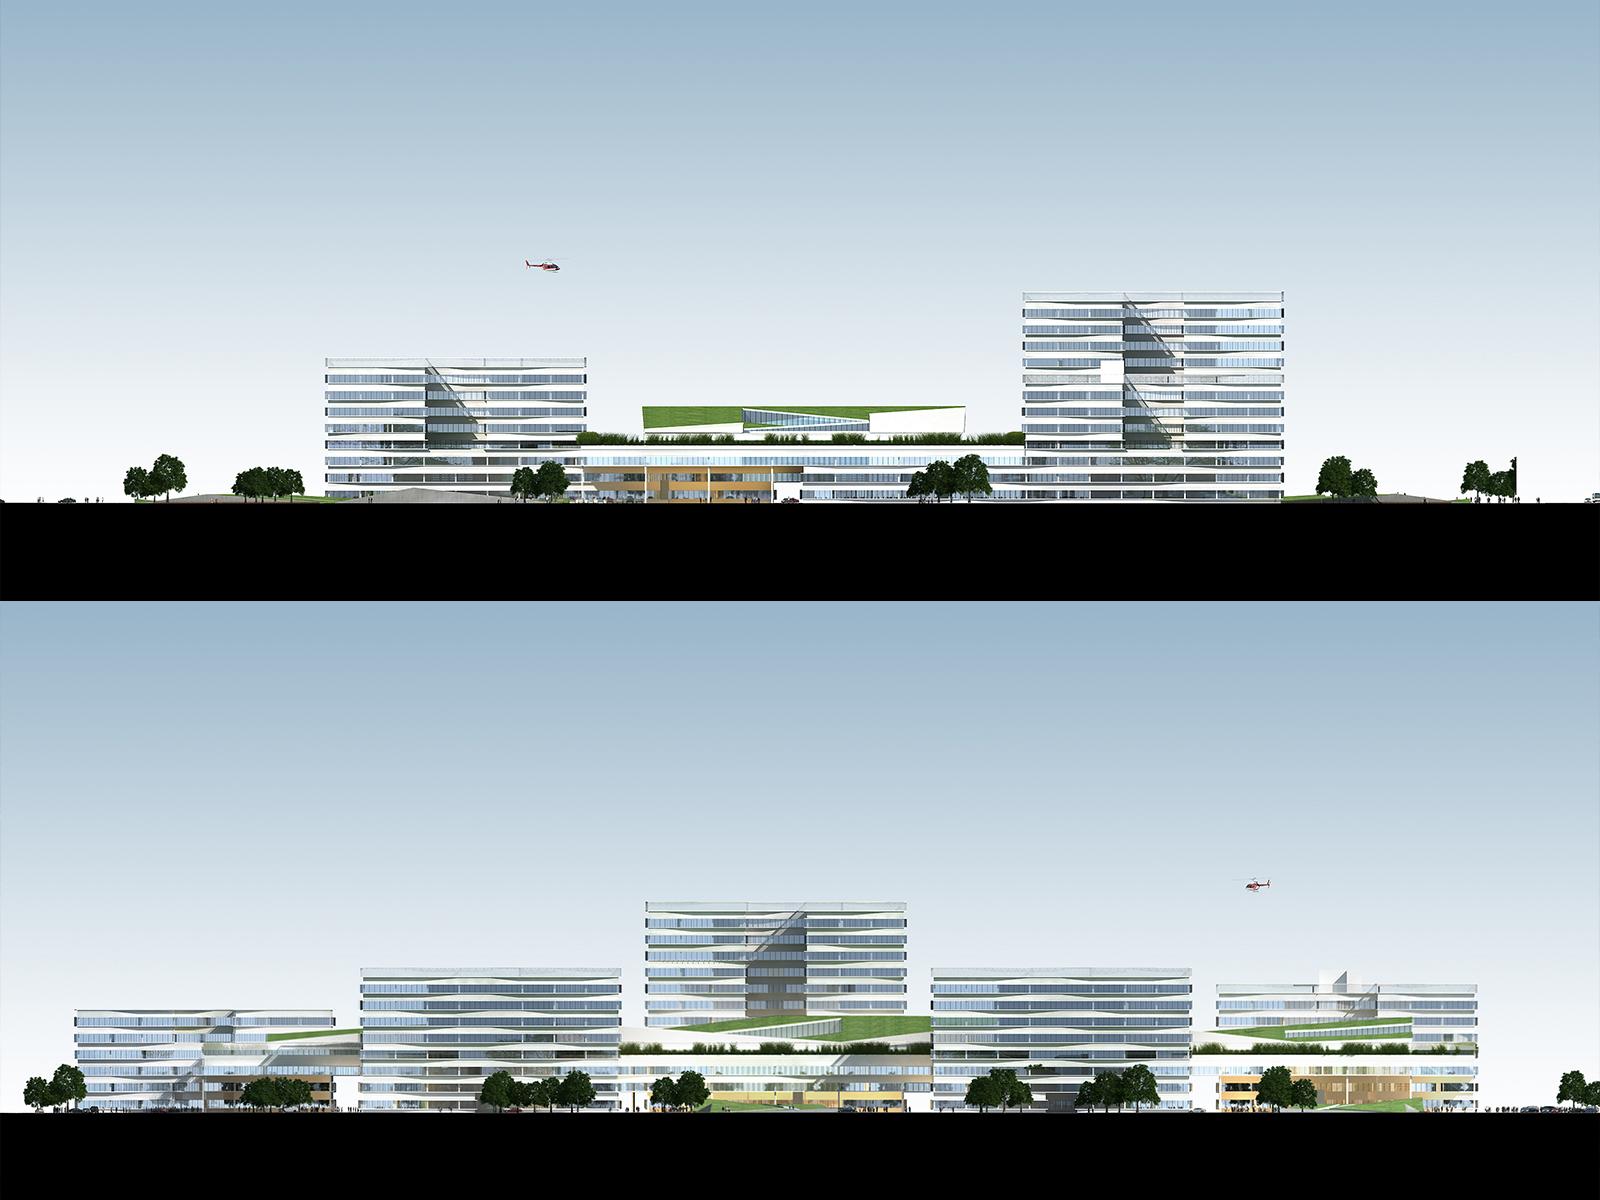 浦口国际医疗城_Pukou New City Hospital Center_Right_04.jpg